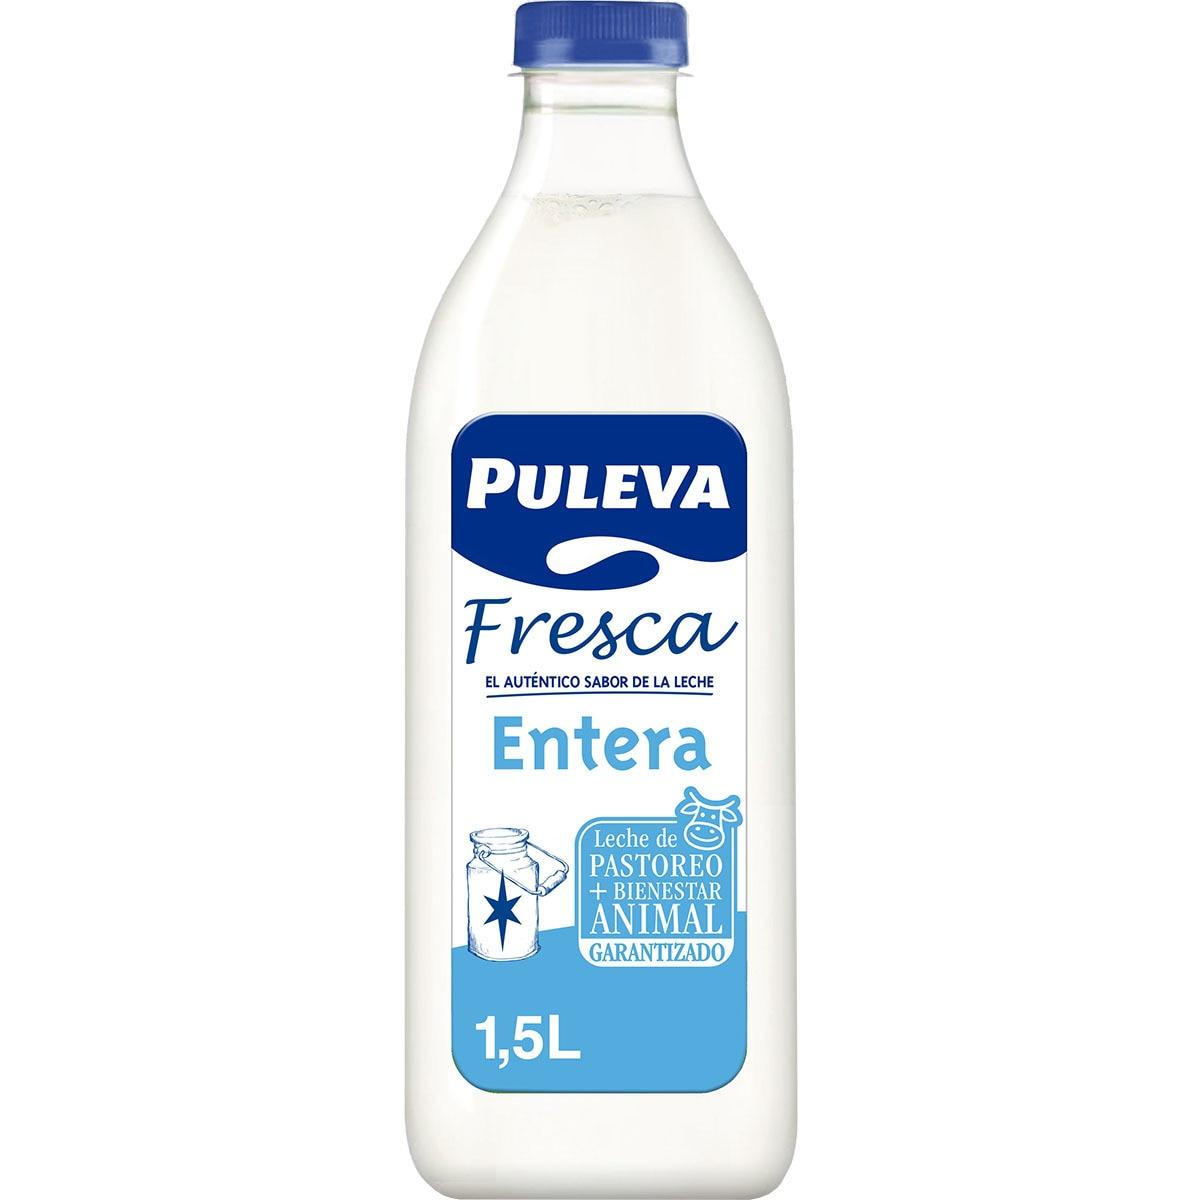 Puleva Fresh Whole Milk 1.5 Ltr